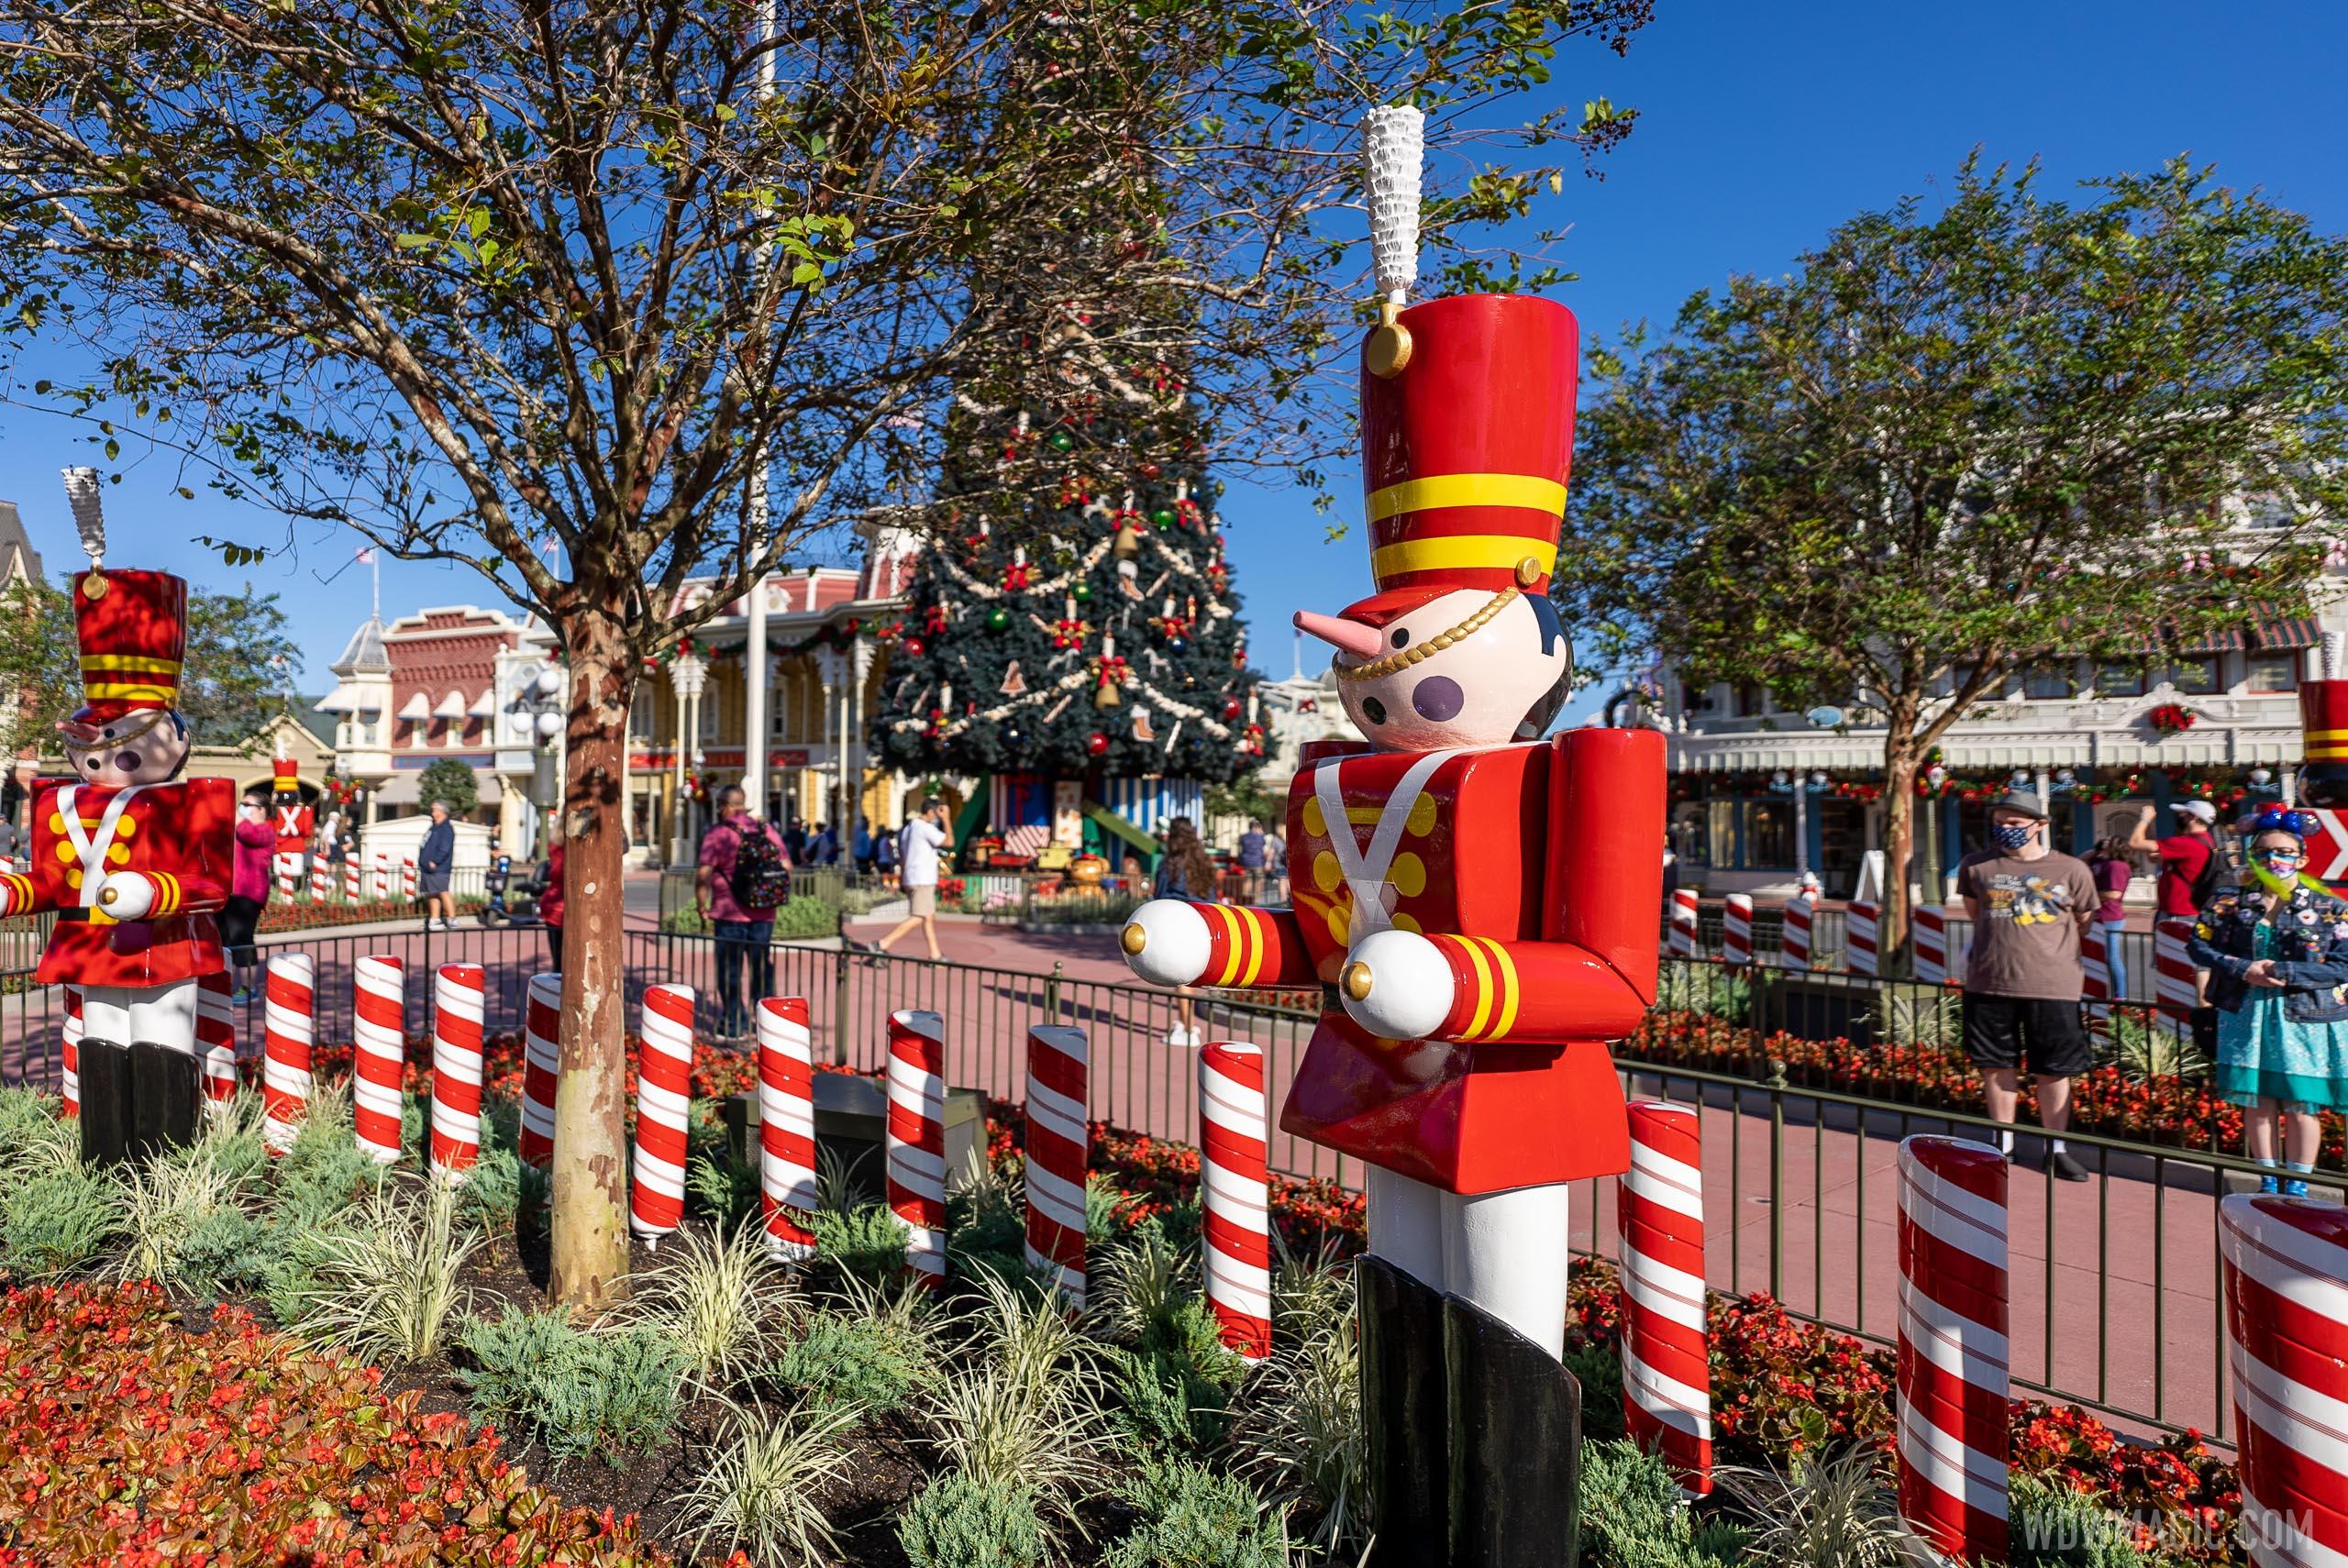 Magic Kingdom Christmas Holiday decorations 2020